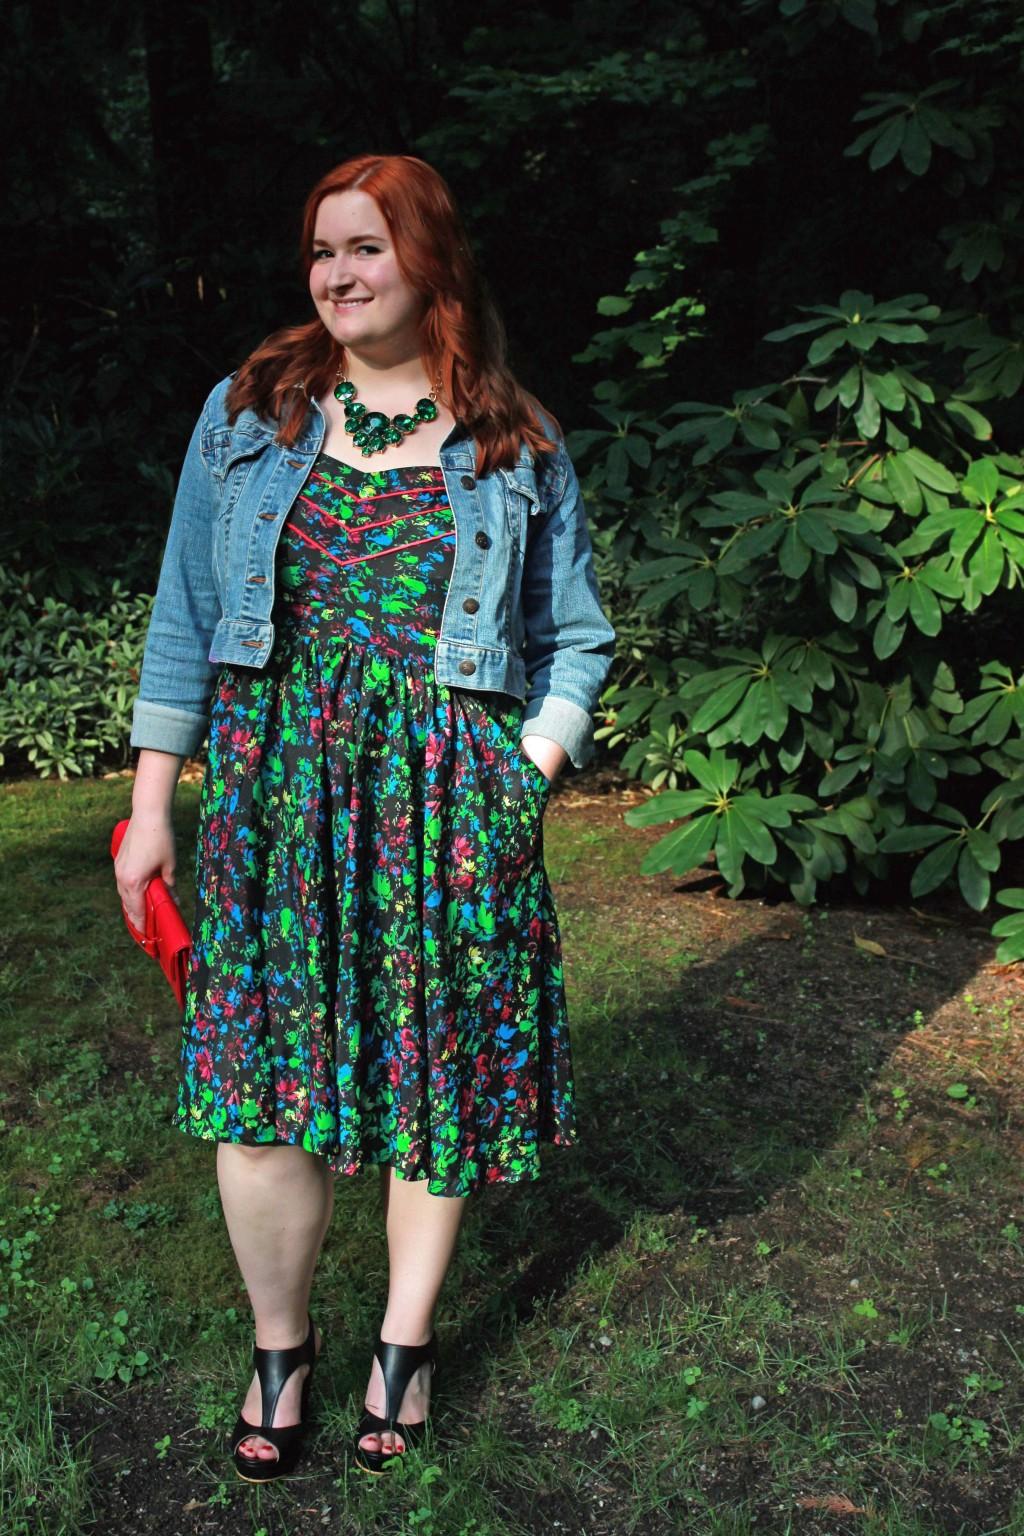 Neon Plus Size Dress